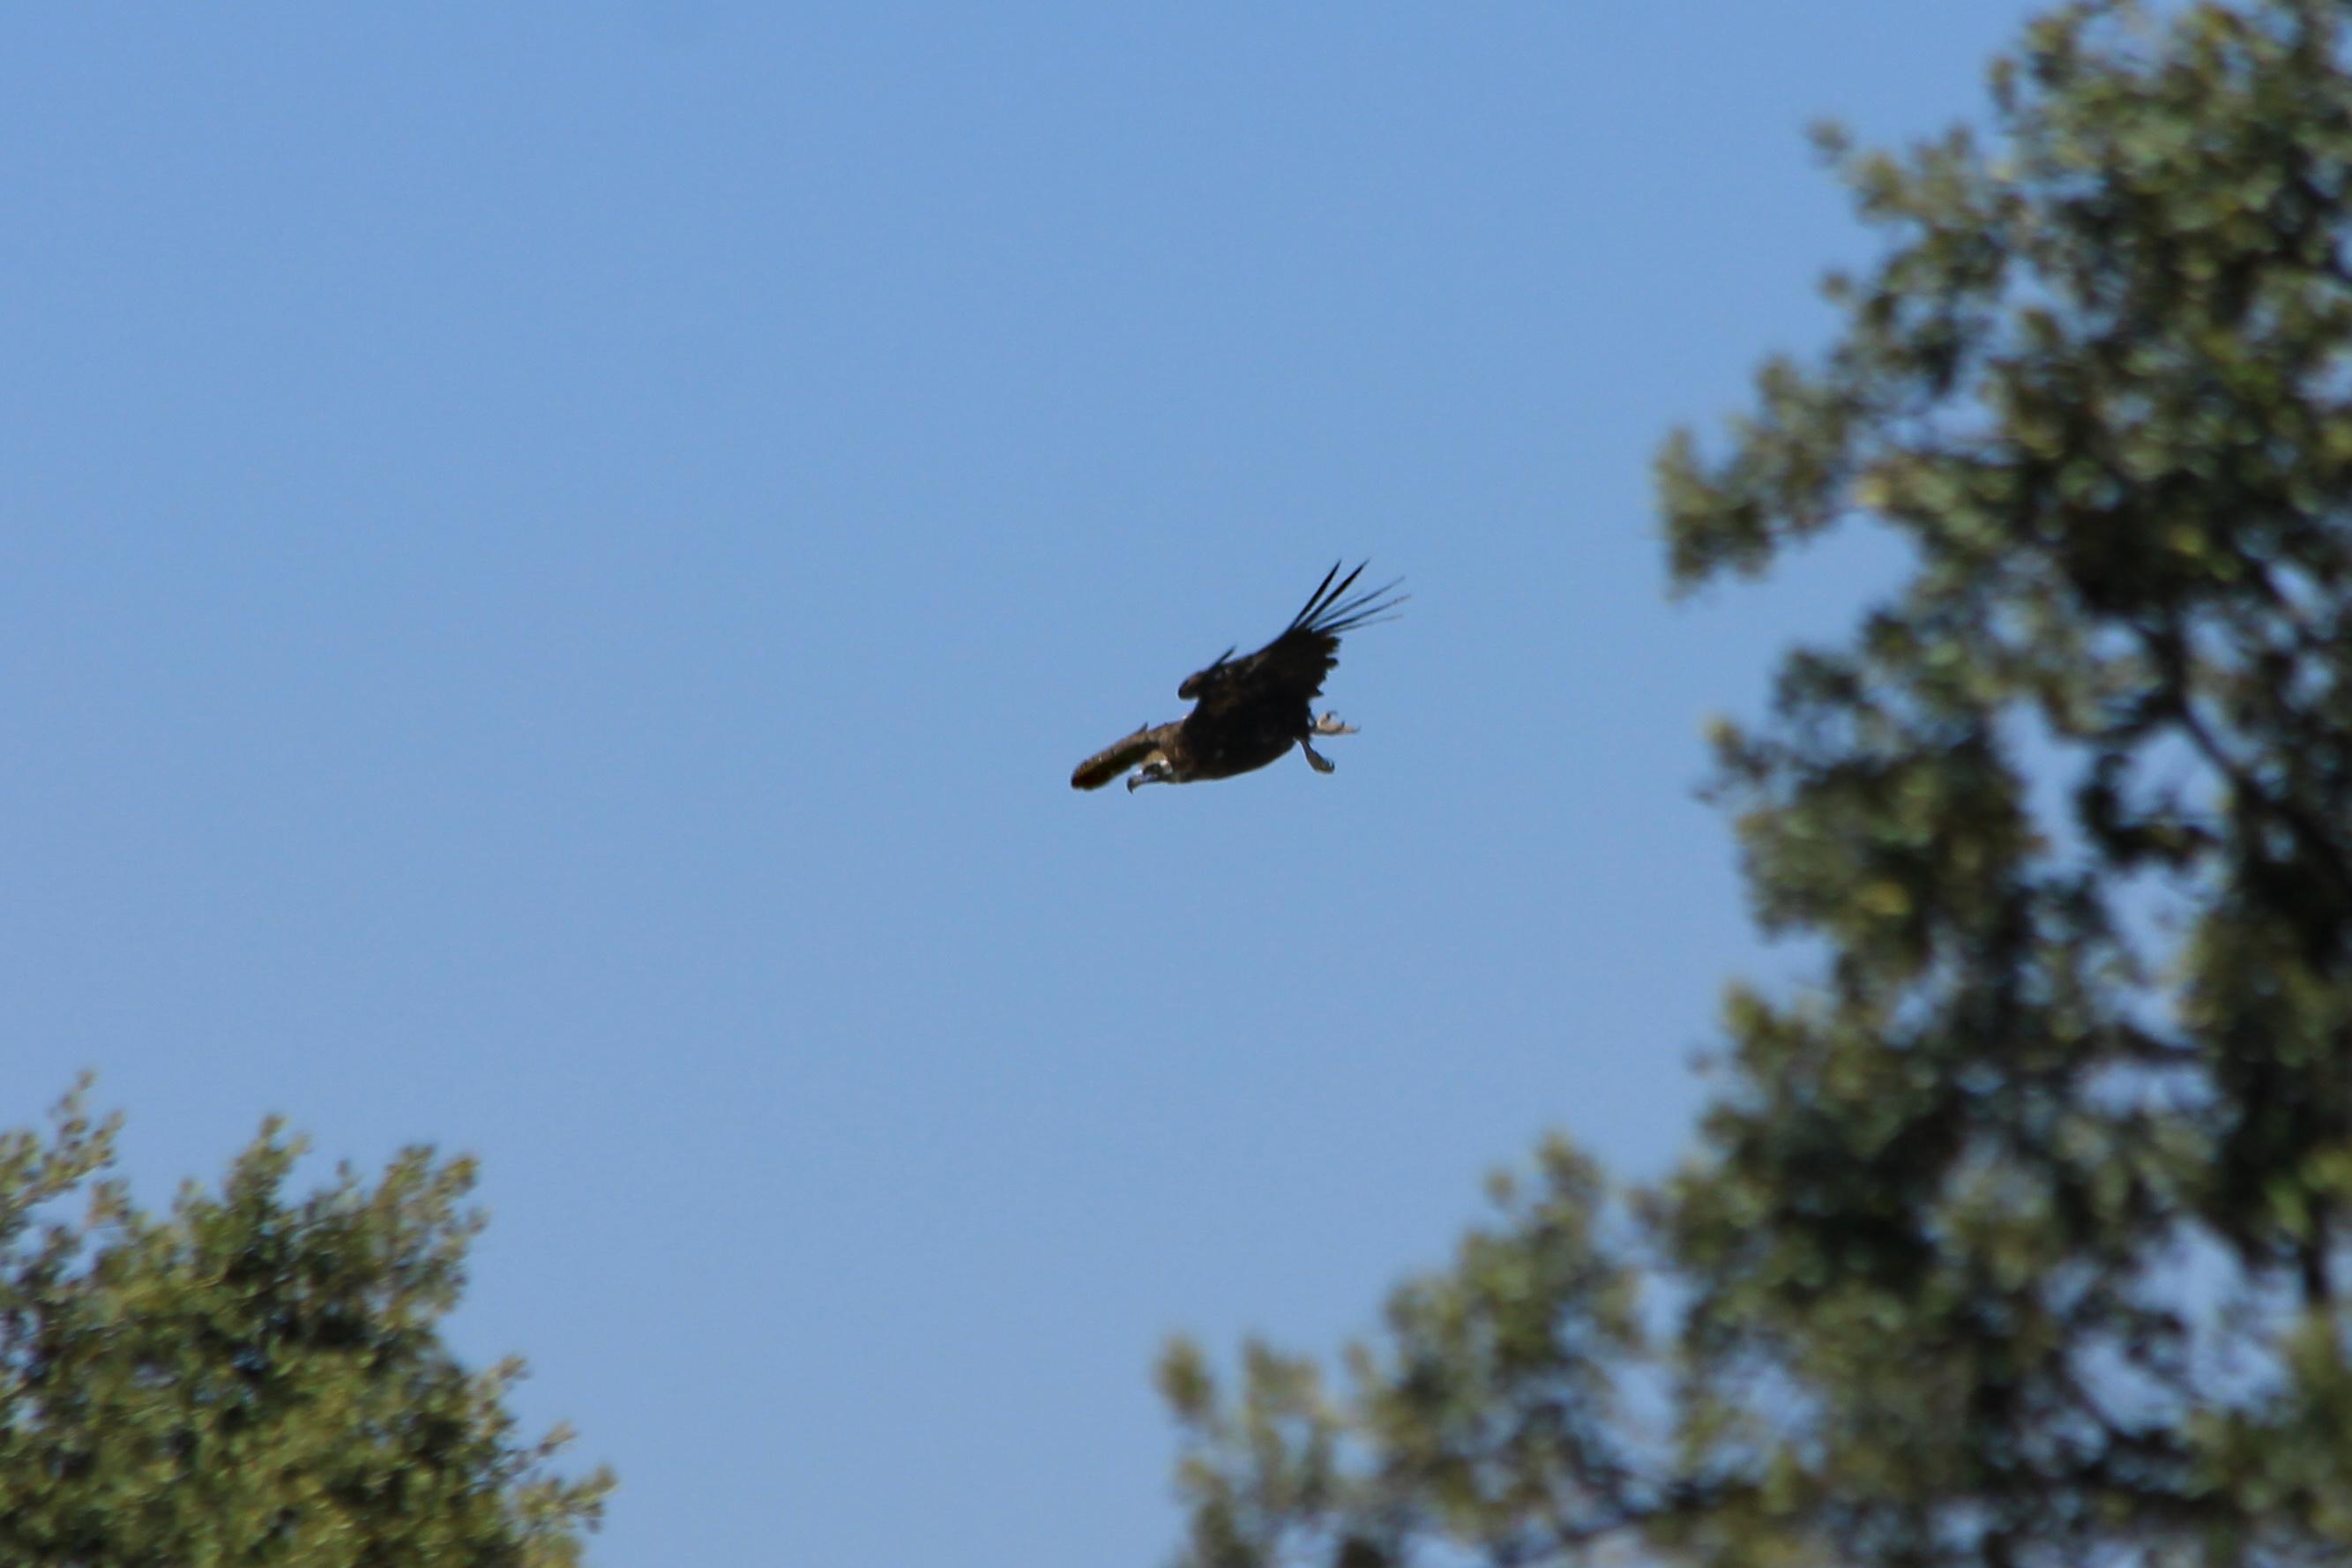 Buitre negro aterrizando